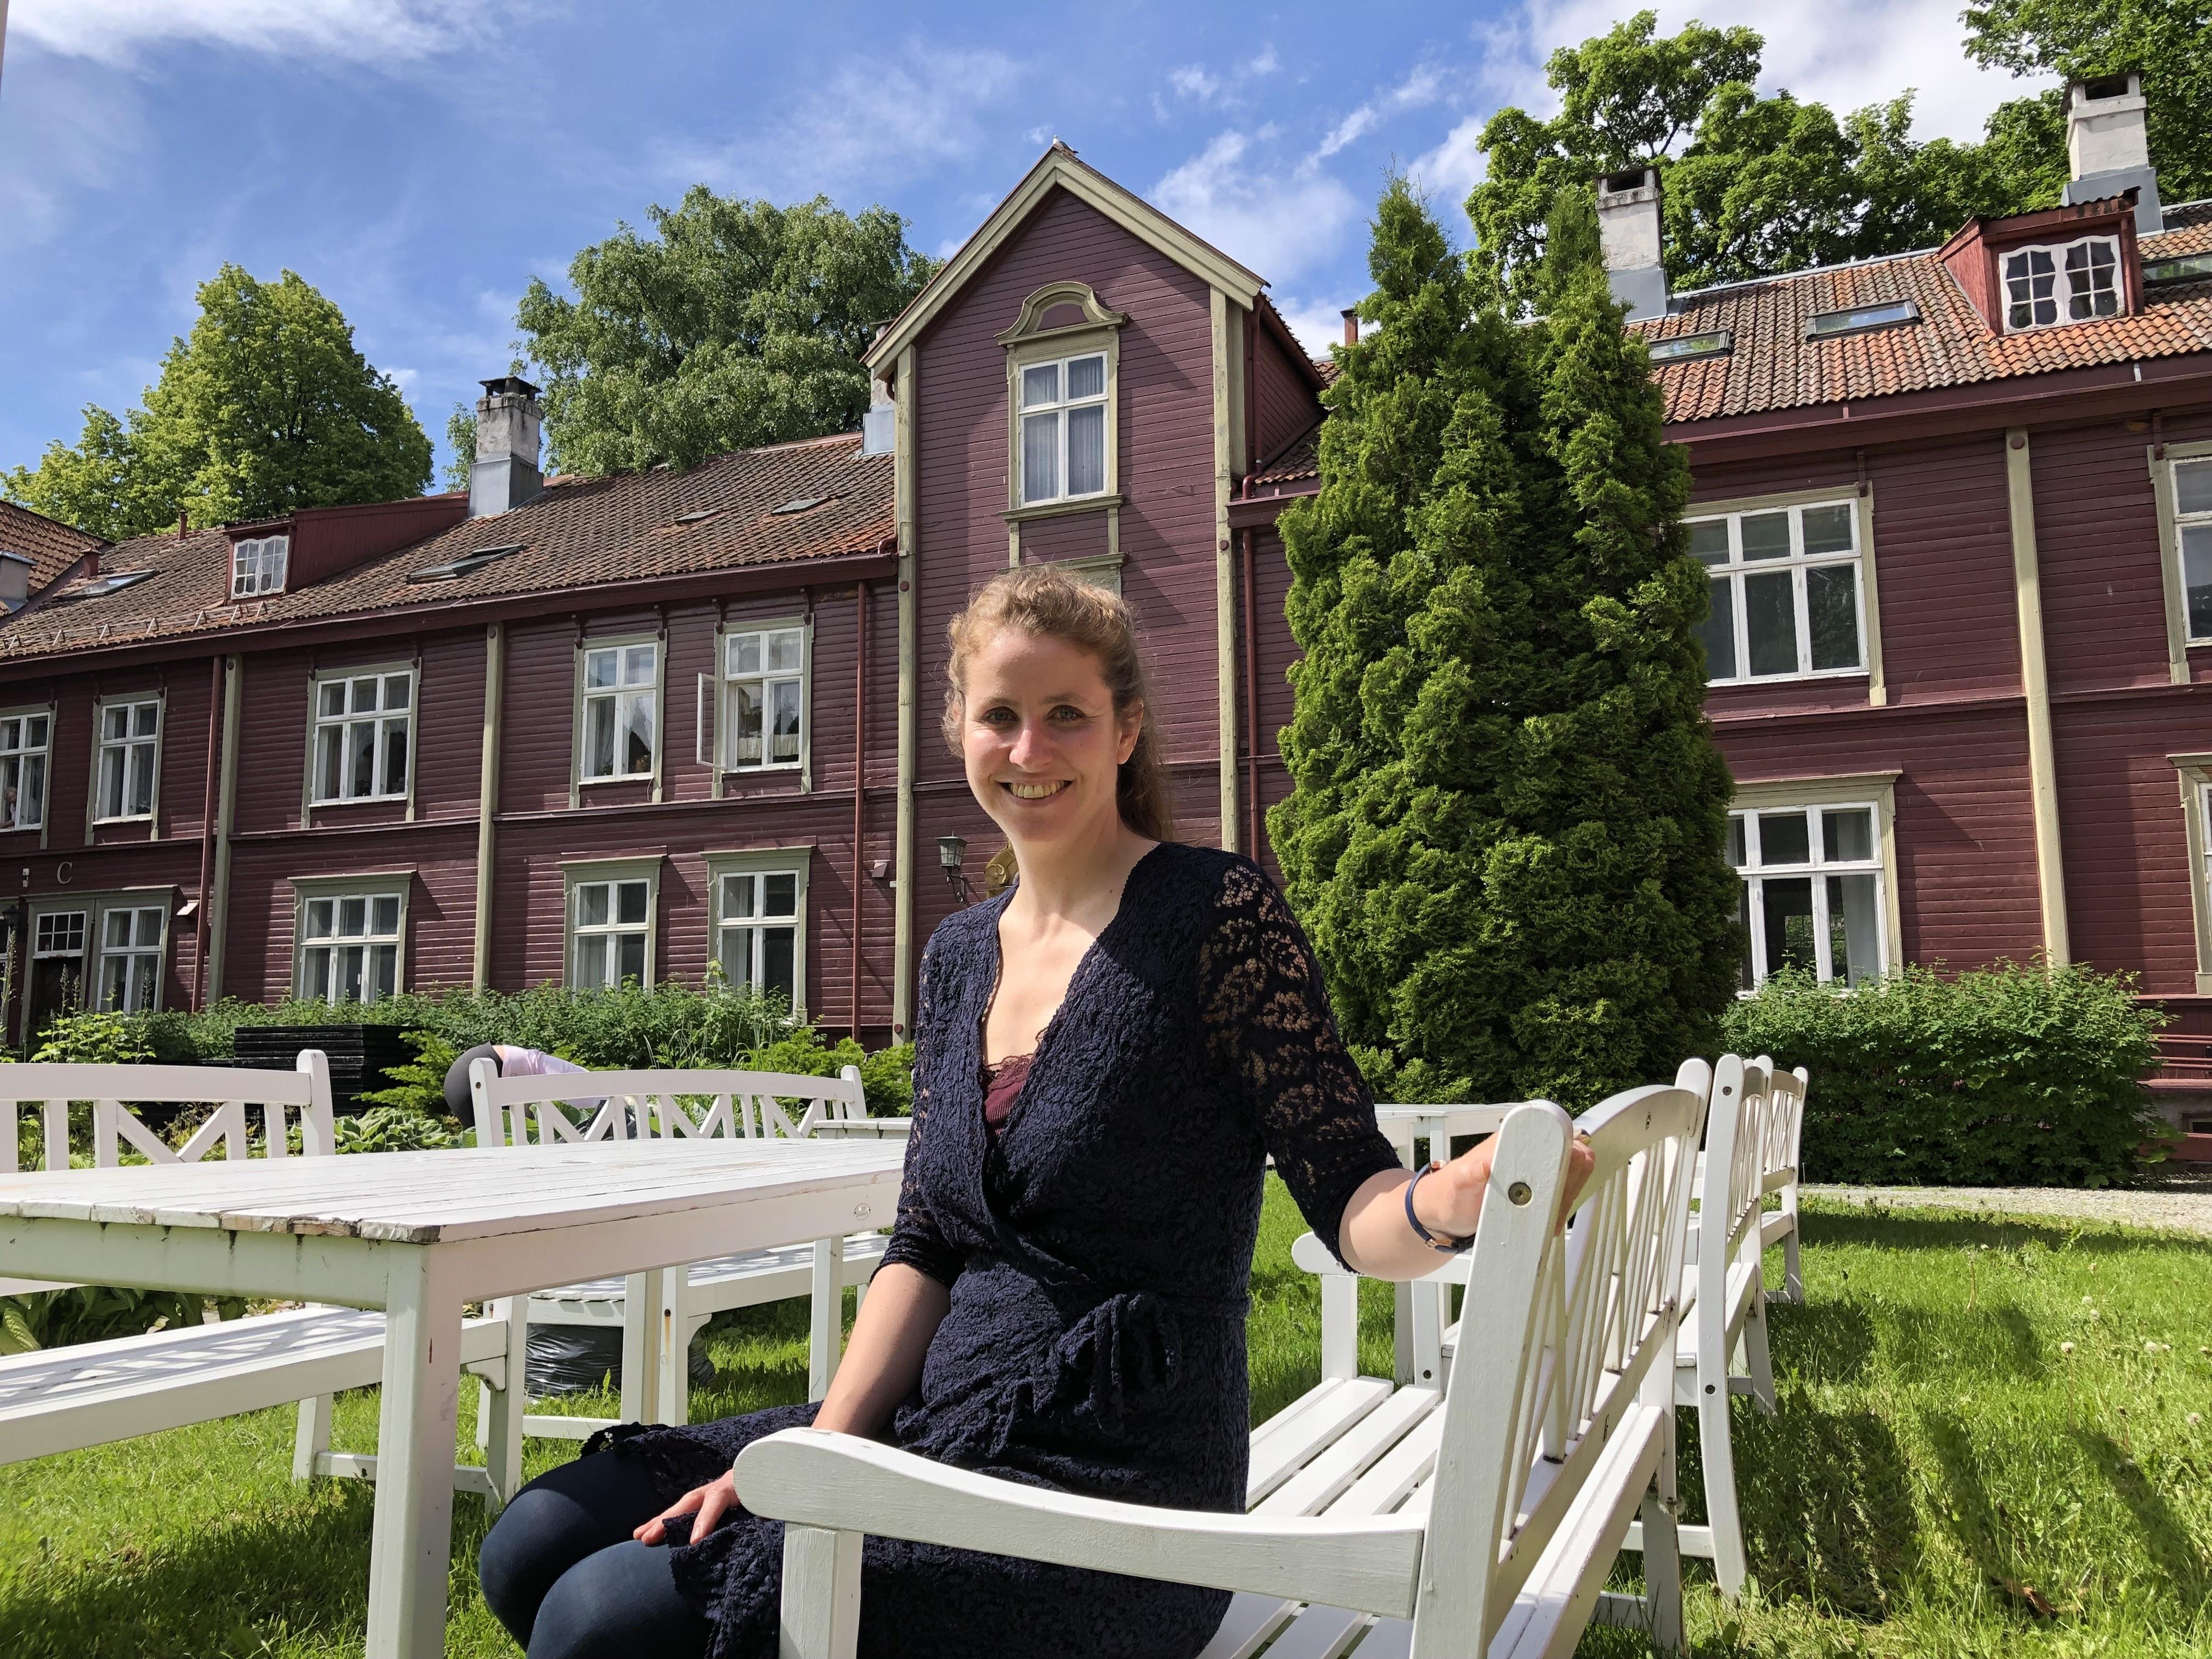 Mari Kristine Brækken